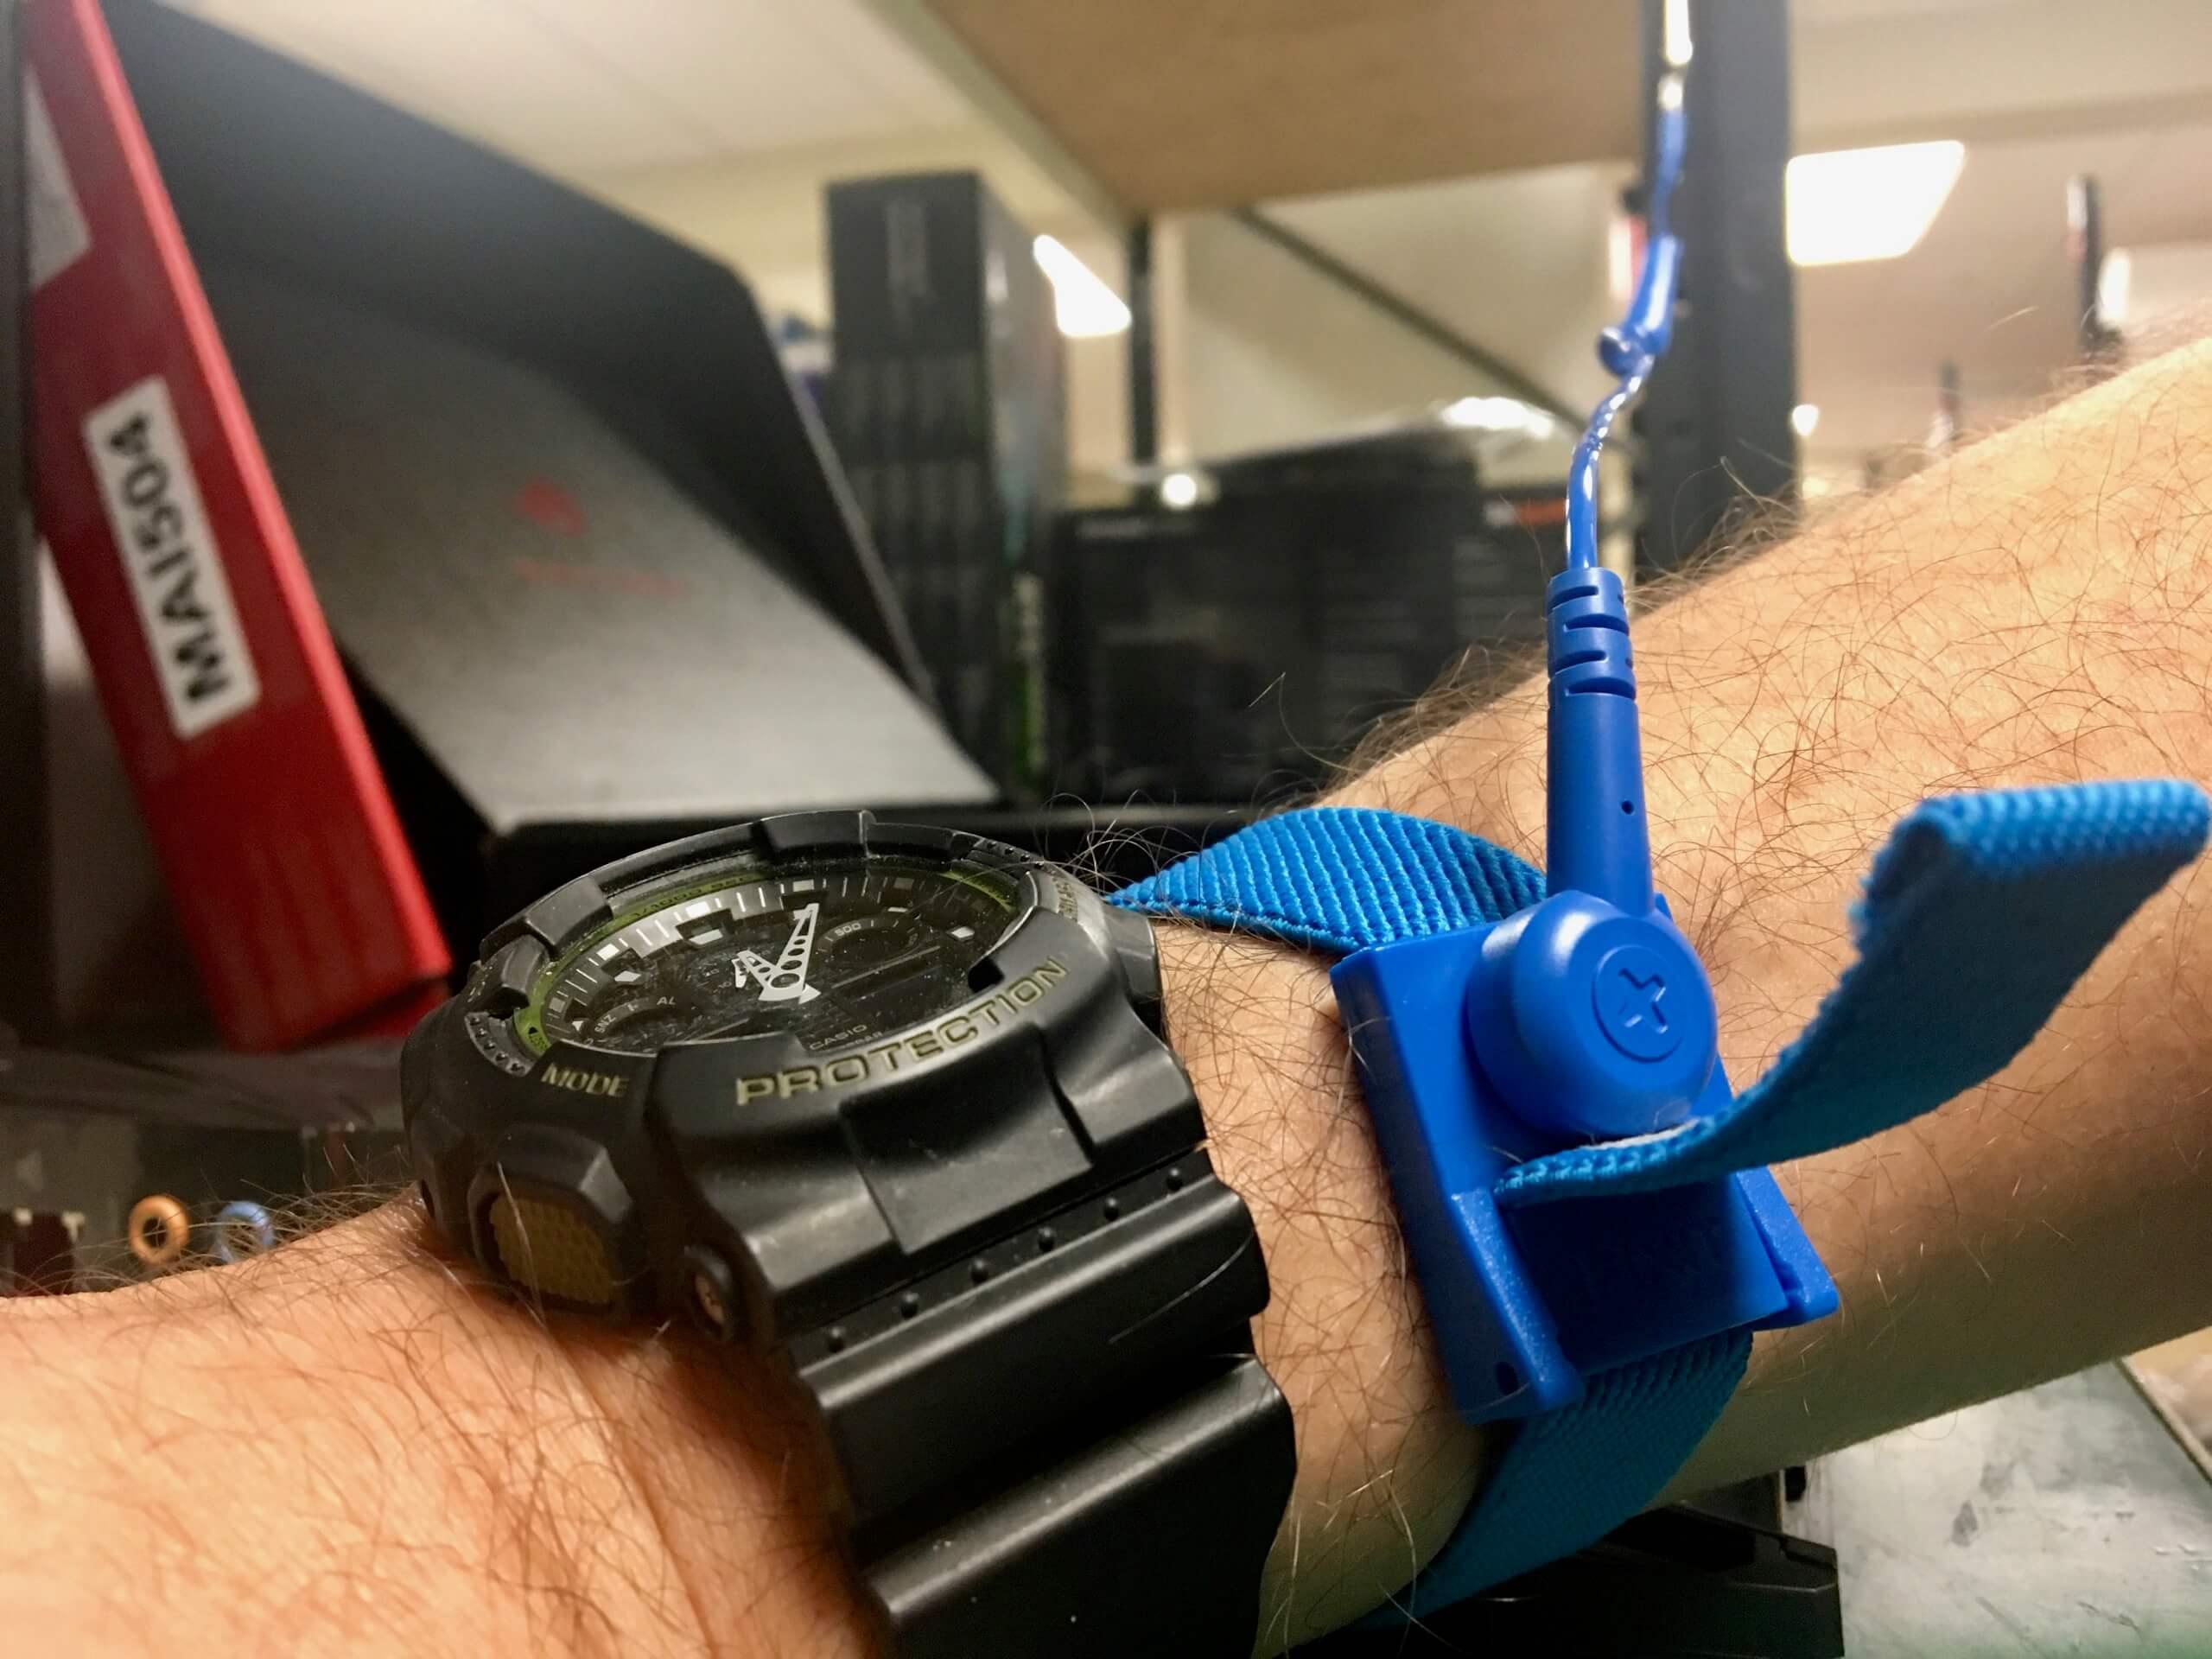 Image #04 Anti Static Wrist Strap